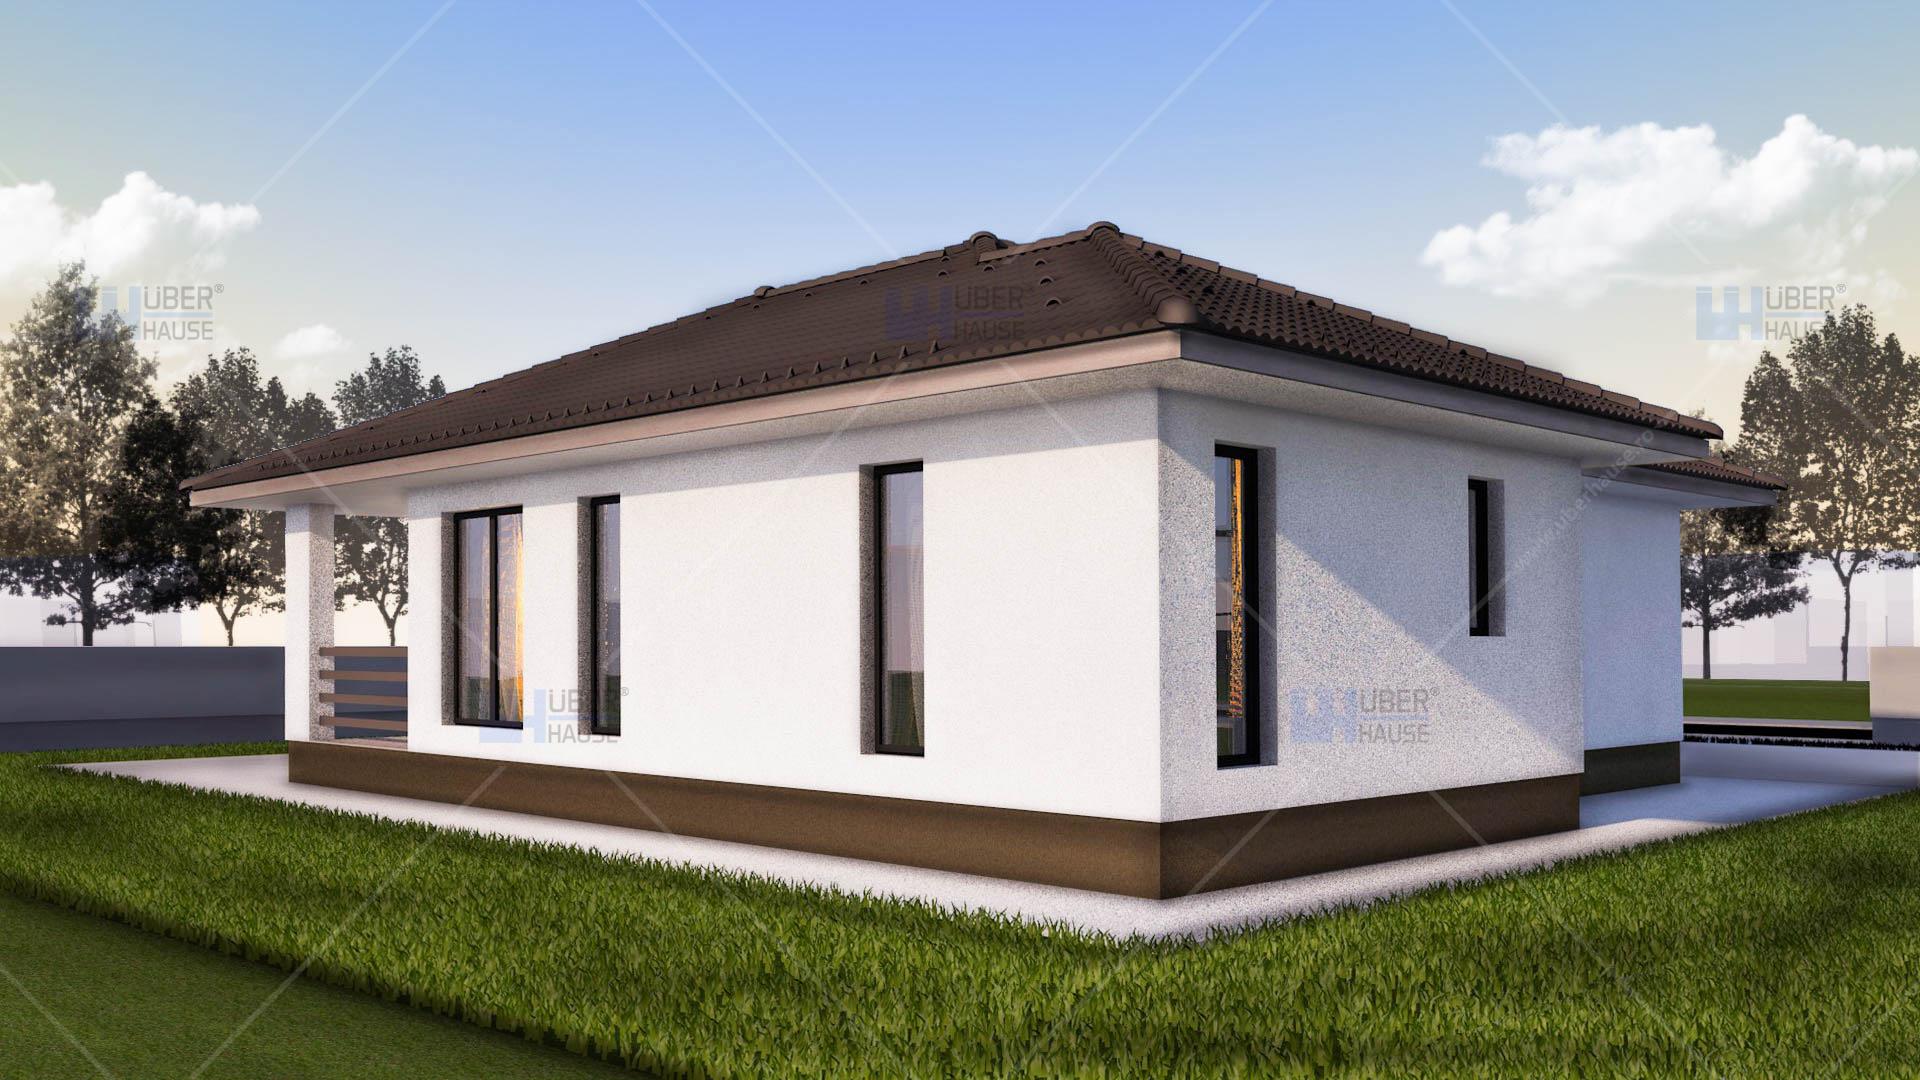 proiect-casa-etaj-Ema-166-UBERhause-ro-5-1920x1080